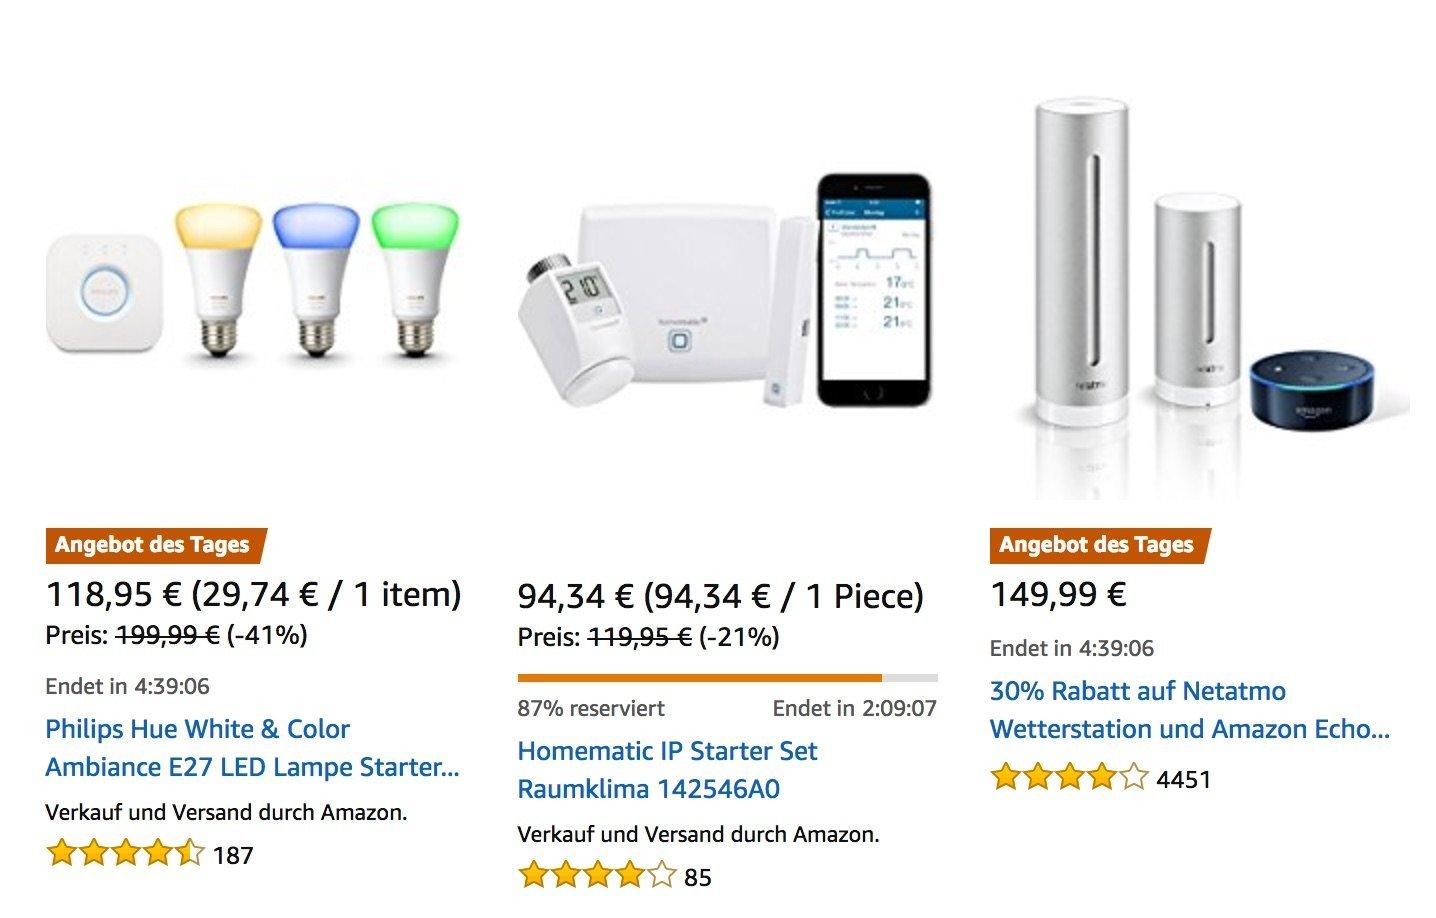 Smart Home Angebote Homematic Amp Philips Hue Starterset Netatmo Osram Lightify Gigaset